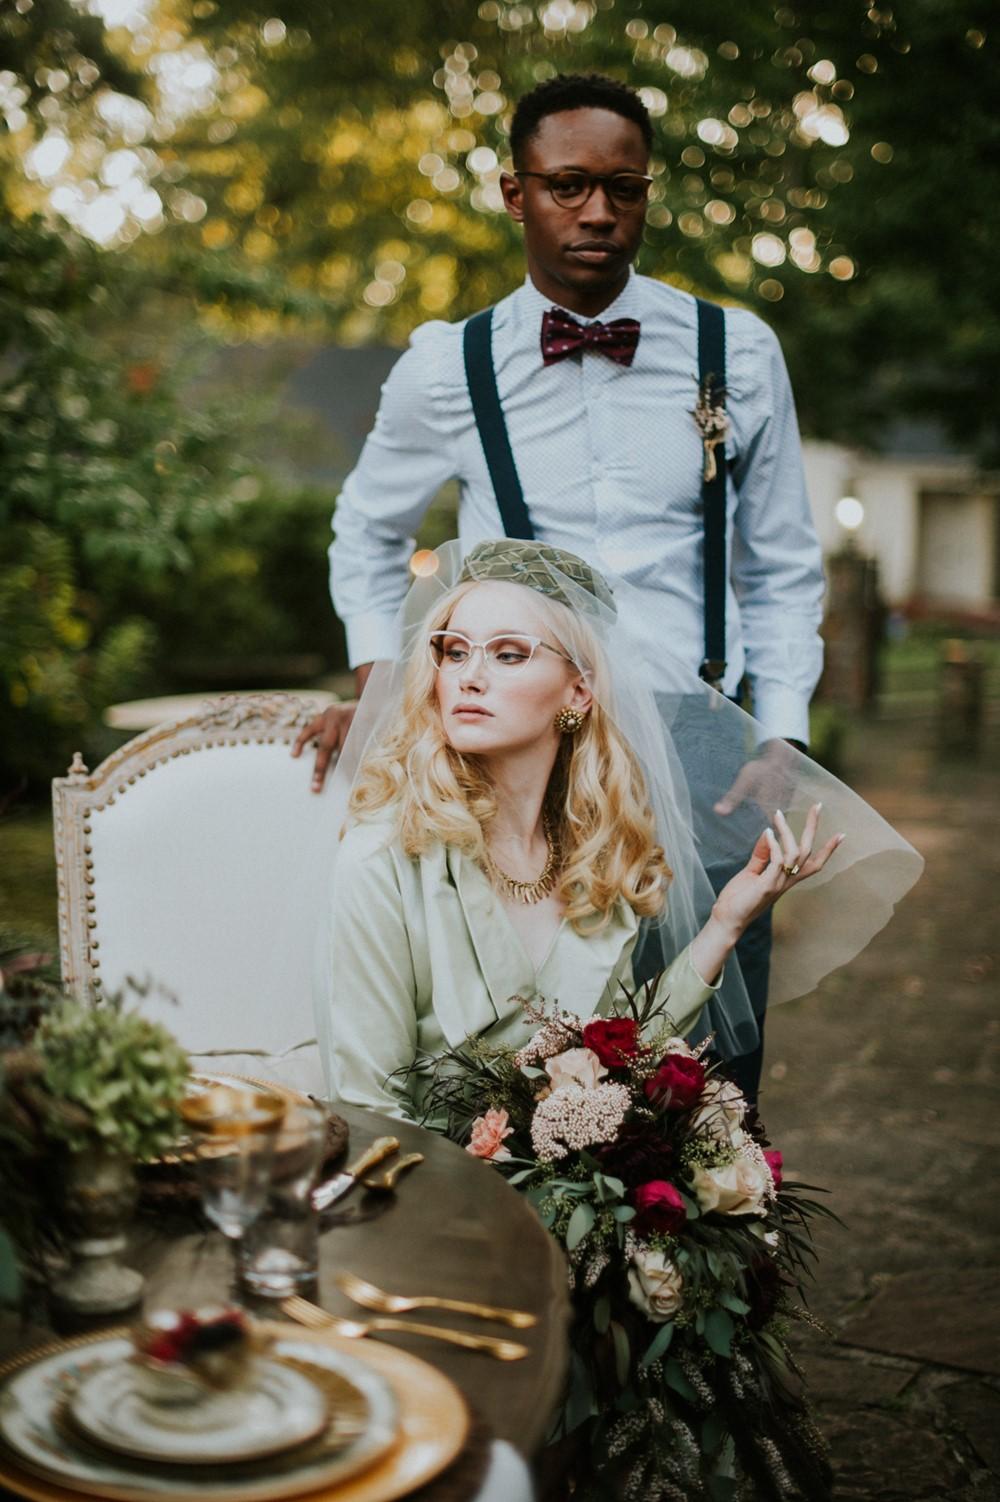 1950s Inspired Bride + Groom // Photography ~ Myranda Randle Photography